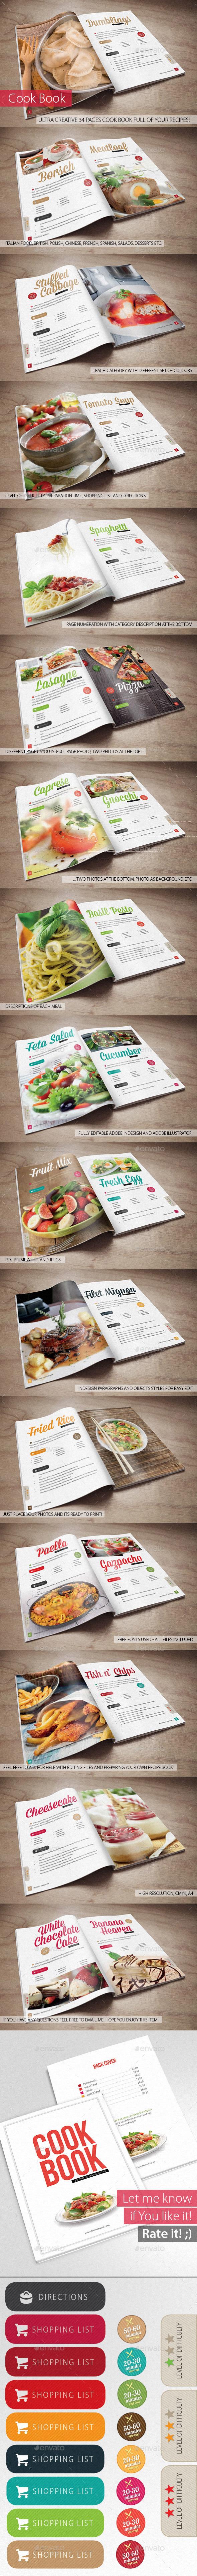 Cook Book - Your Recipes - Brochures Print Templates